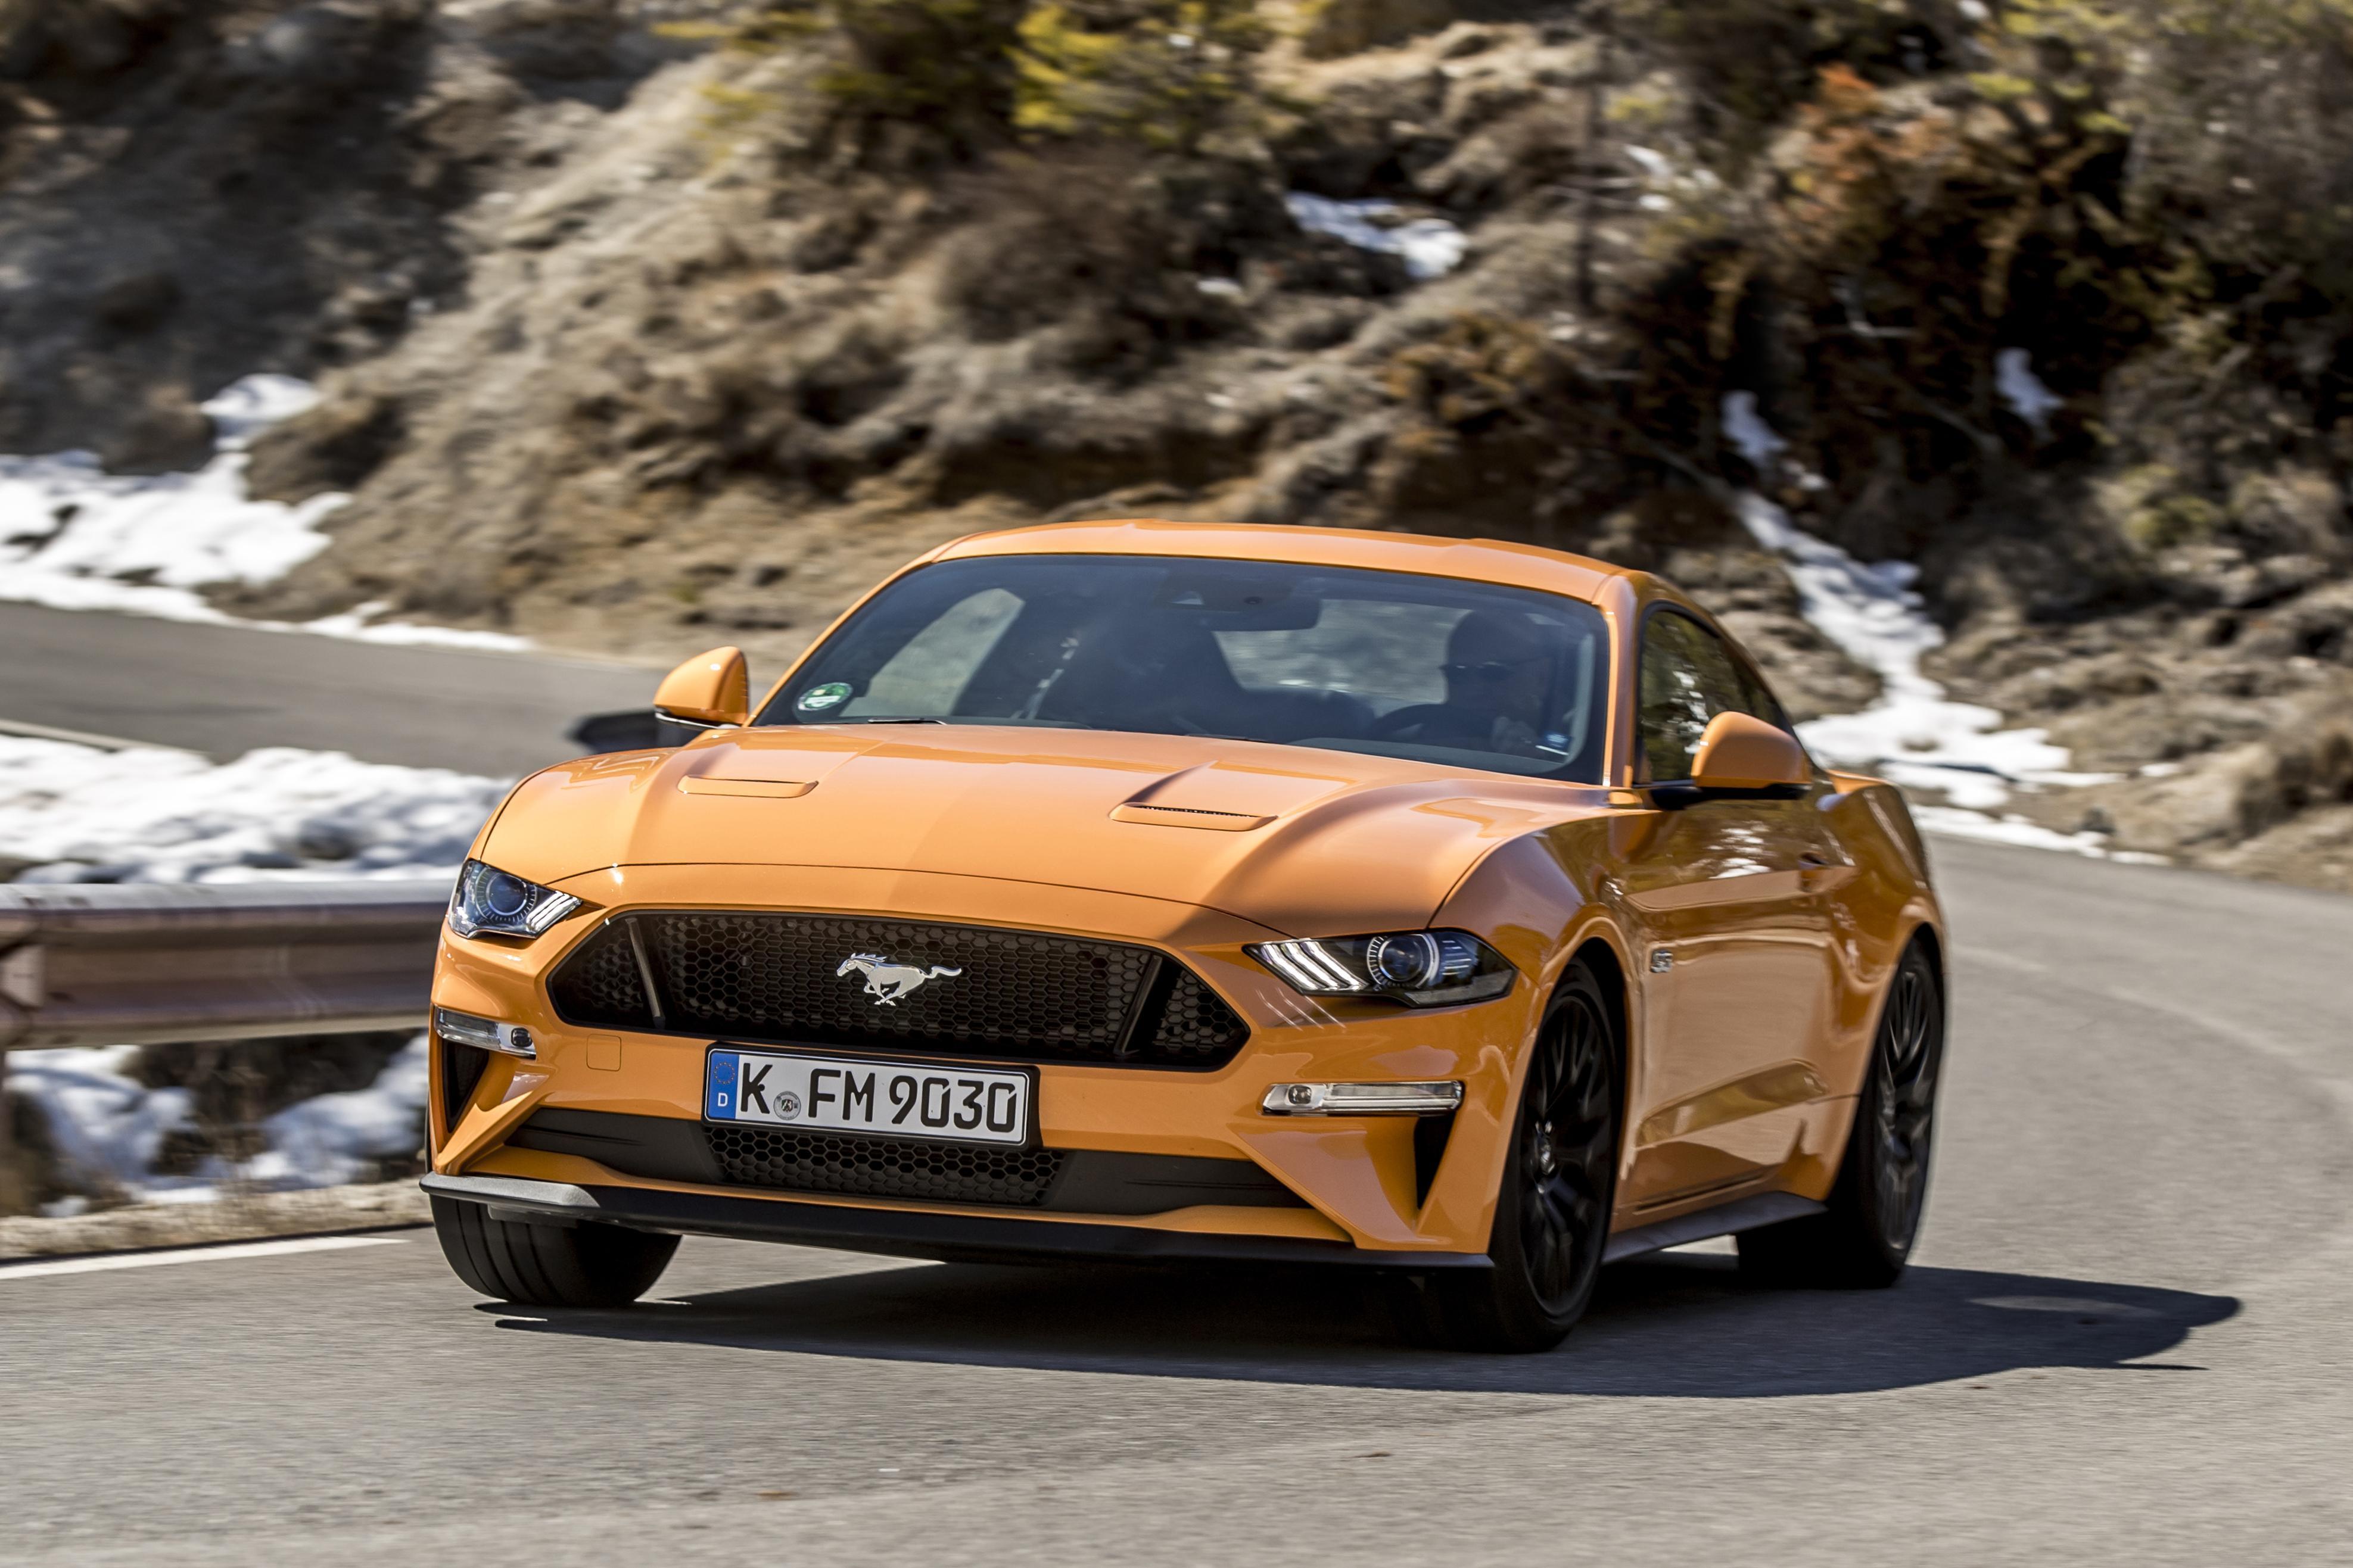 Mustang orange fury 017 k8ed u43460541639835fci 3950x2633corriere web sezioni jpgv201803281550